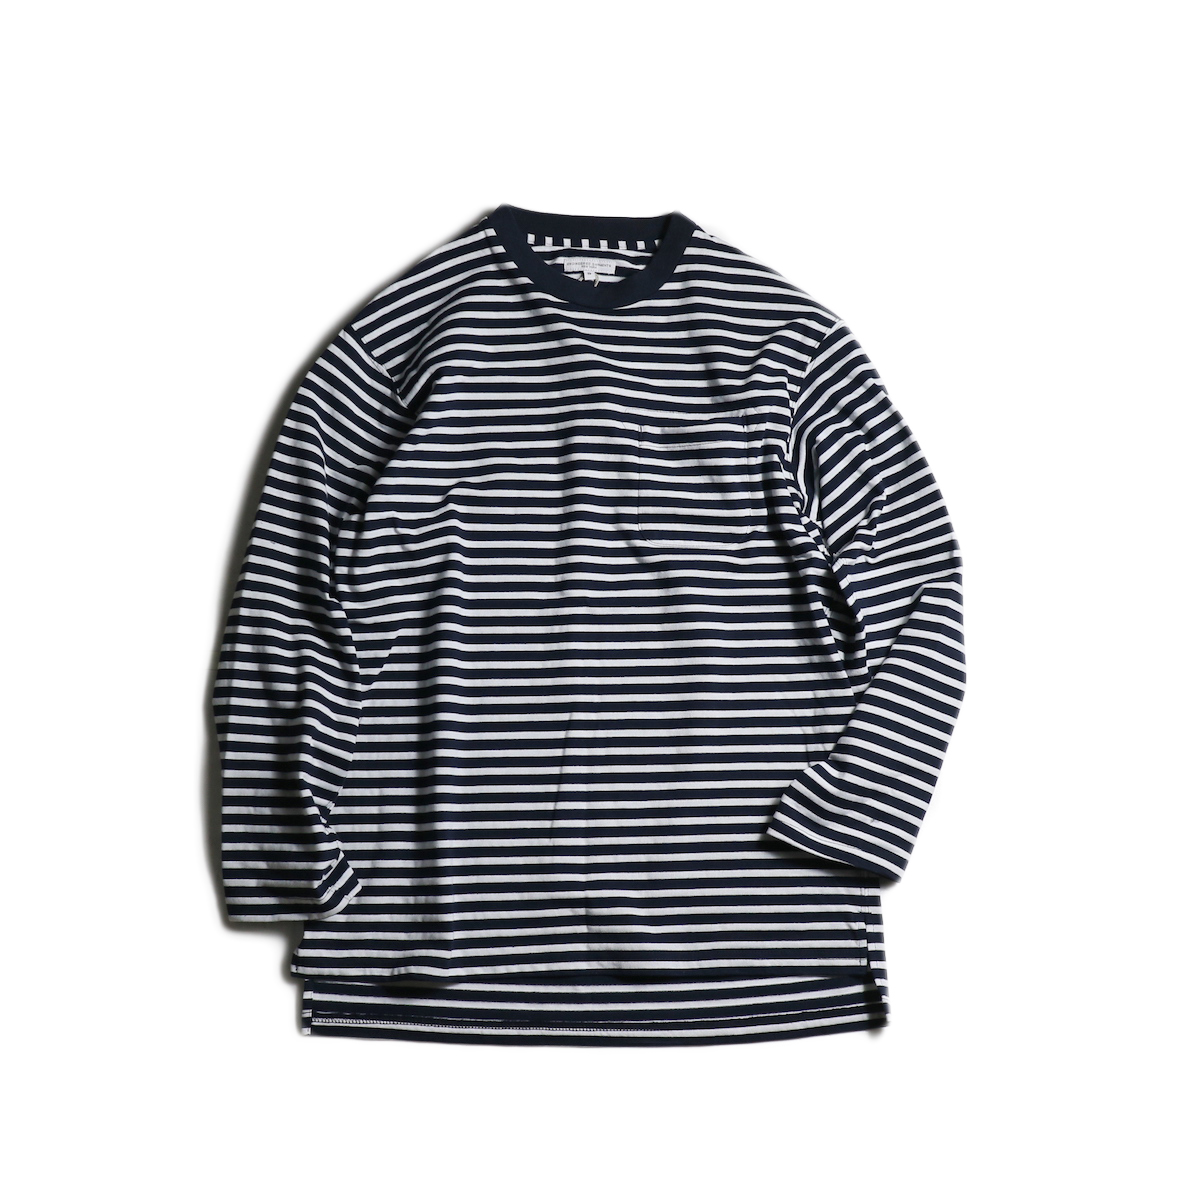 Engineered Garments / LS Crewneck Shirt -PC St. Jersey (Navy/White)